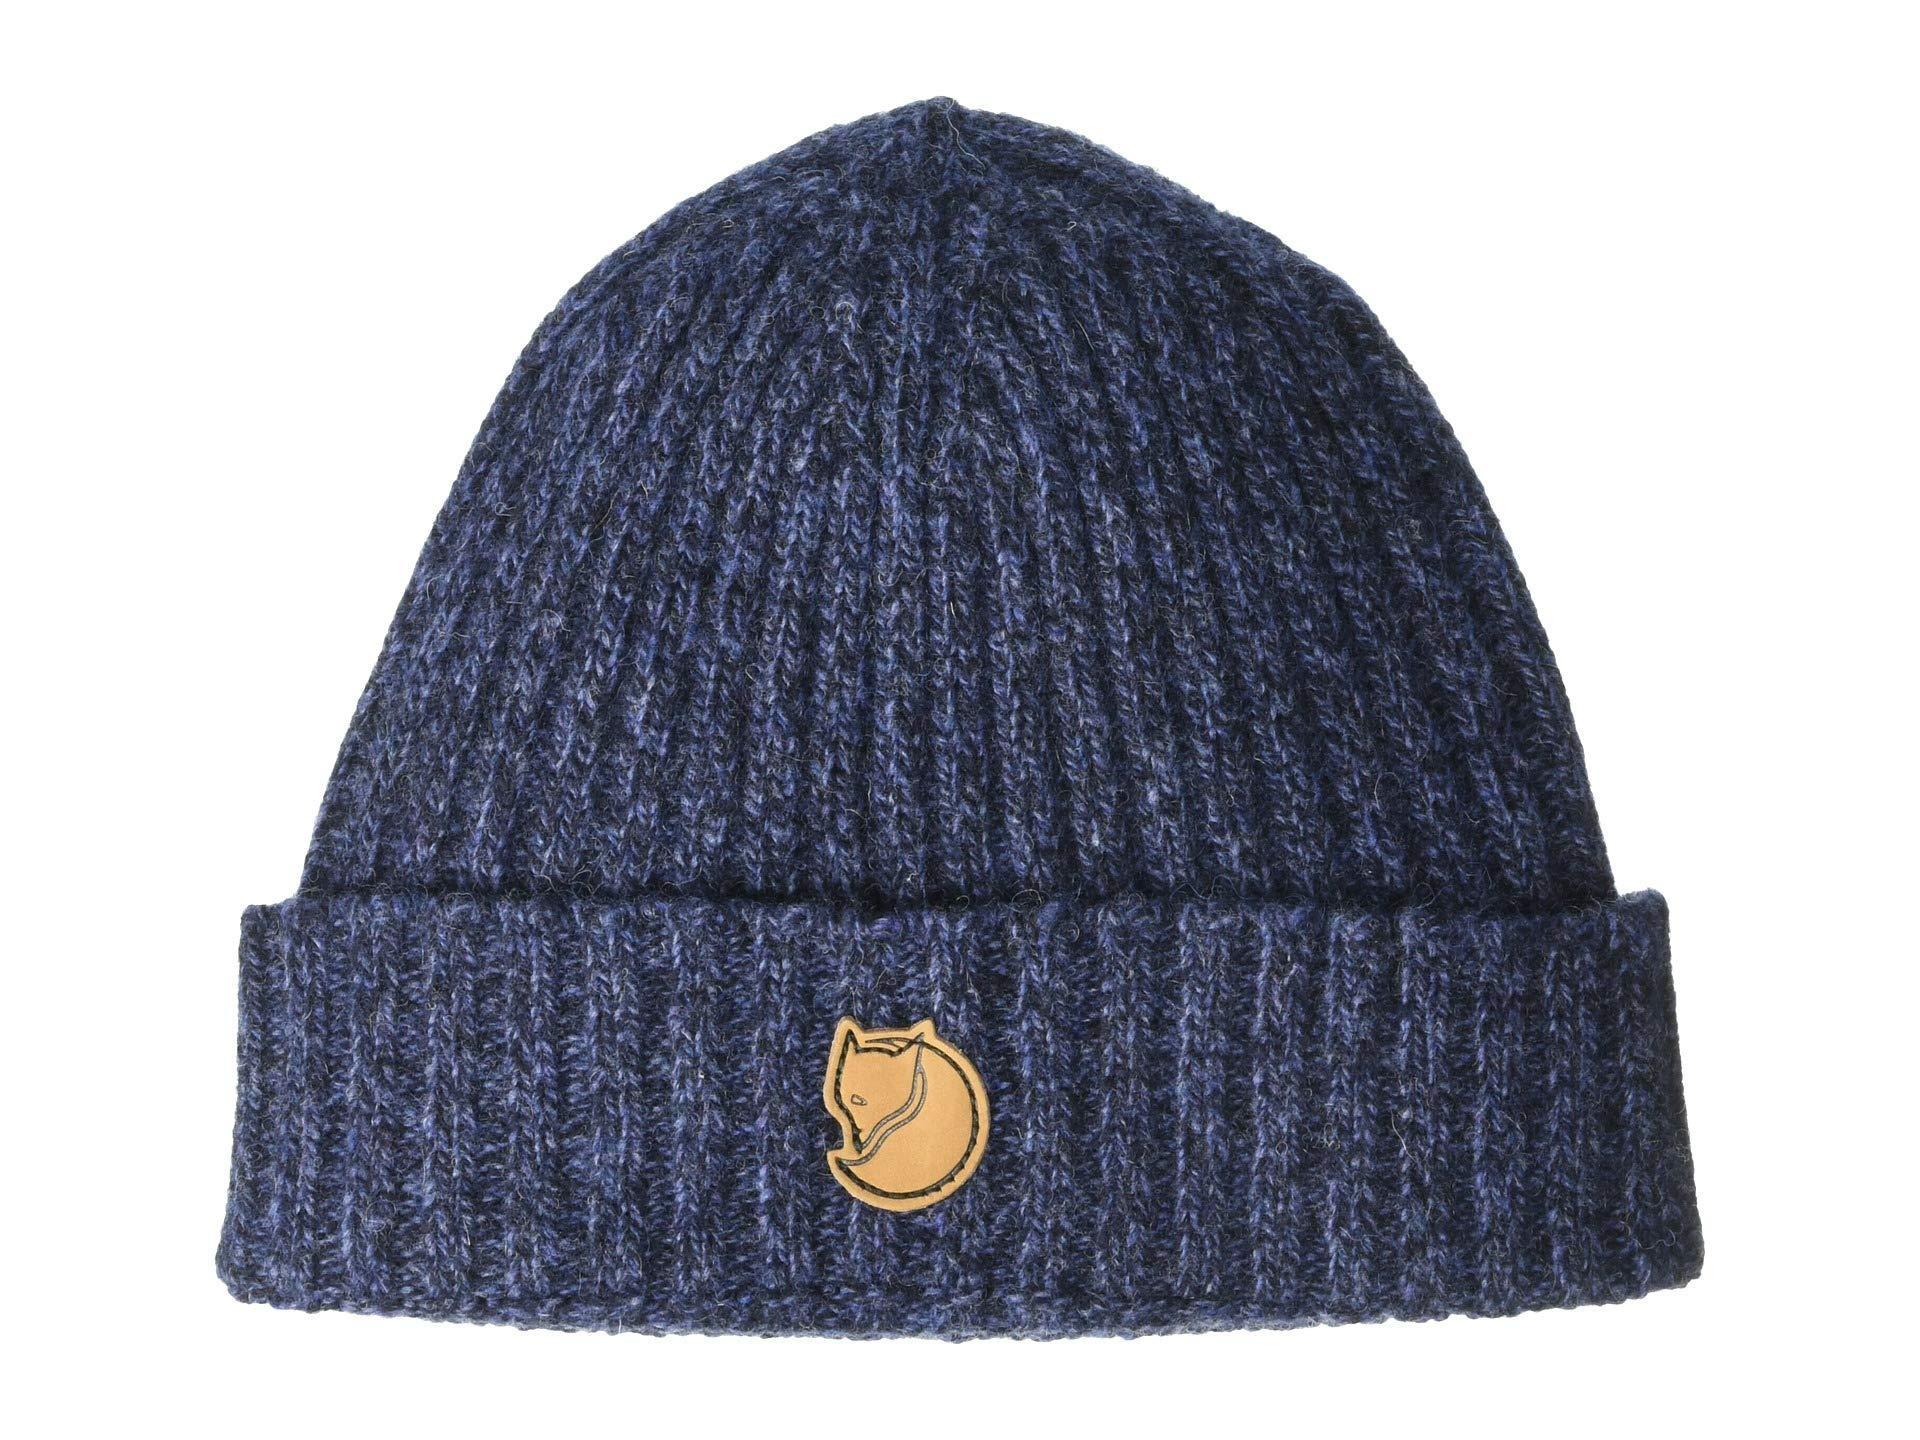 Lyst - Fjallraven Re-wool Hat (acorn) Caps in Blue for Men 6c6838606ba1